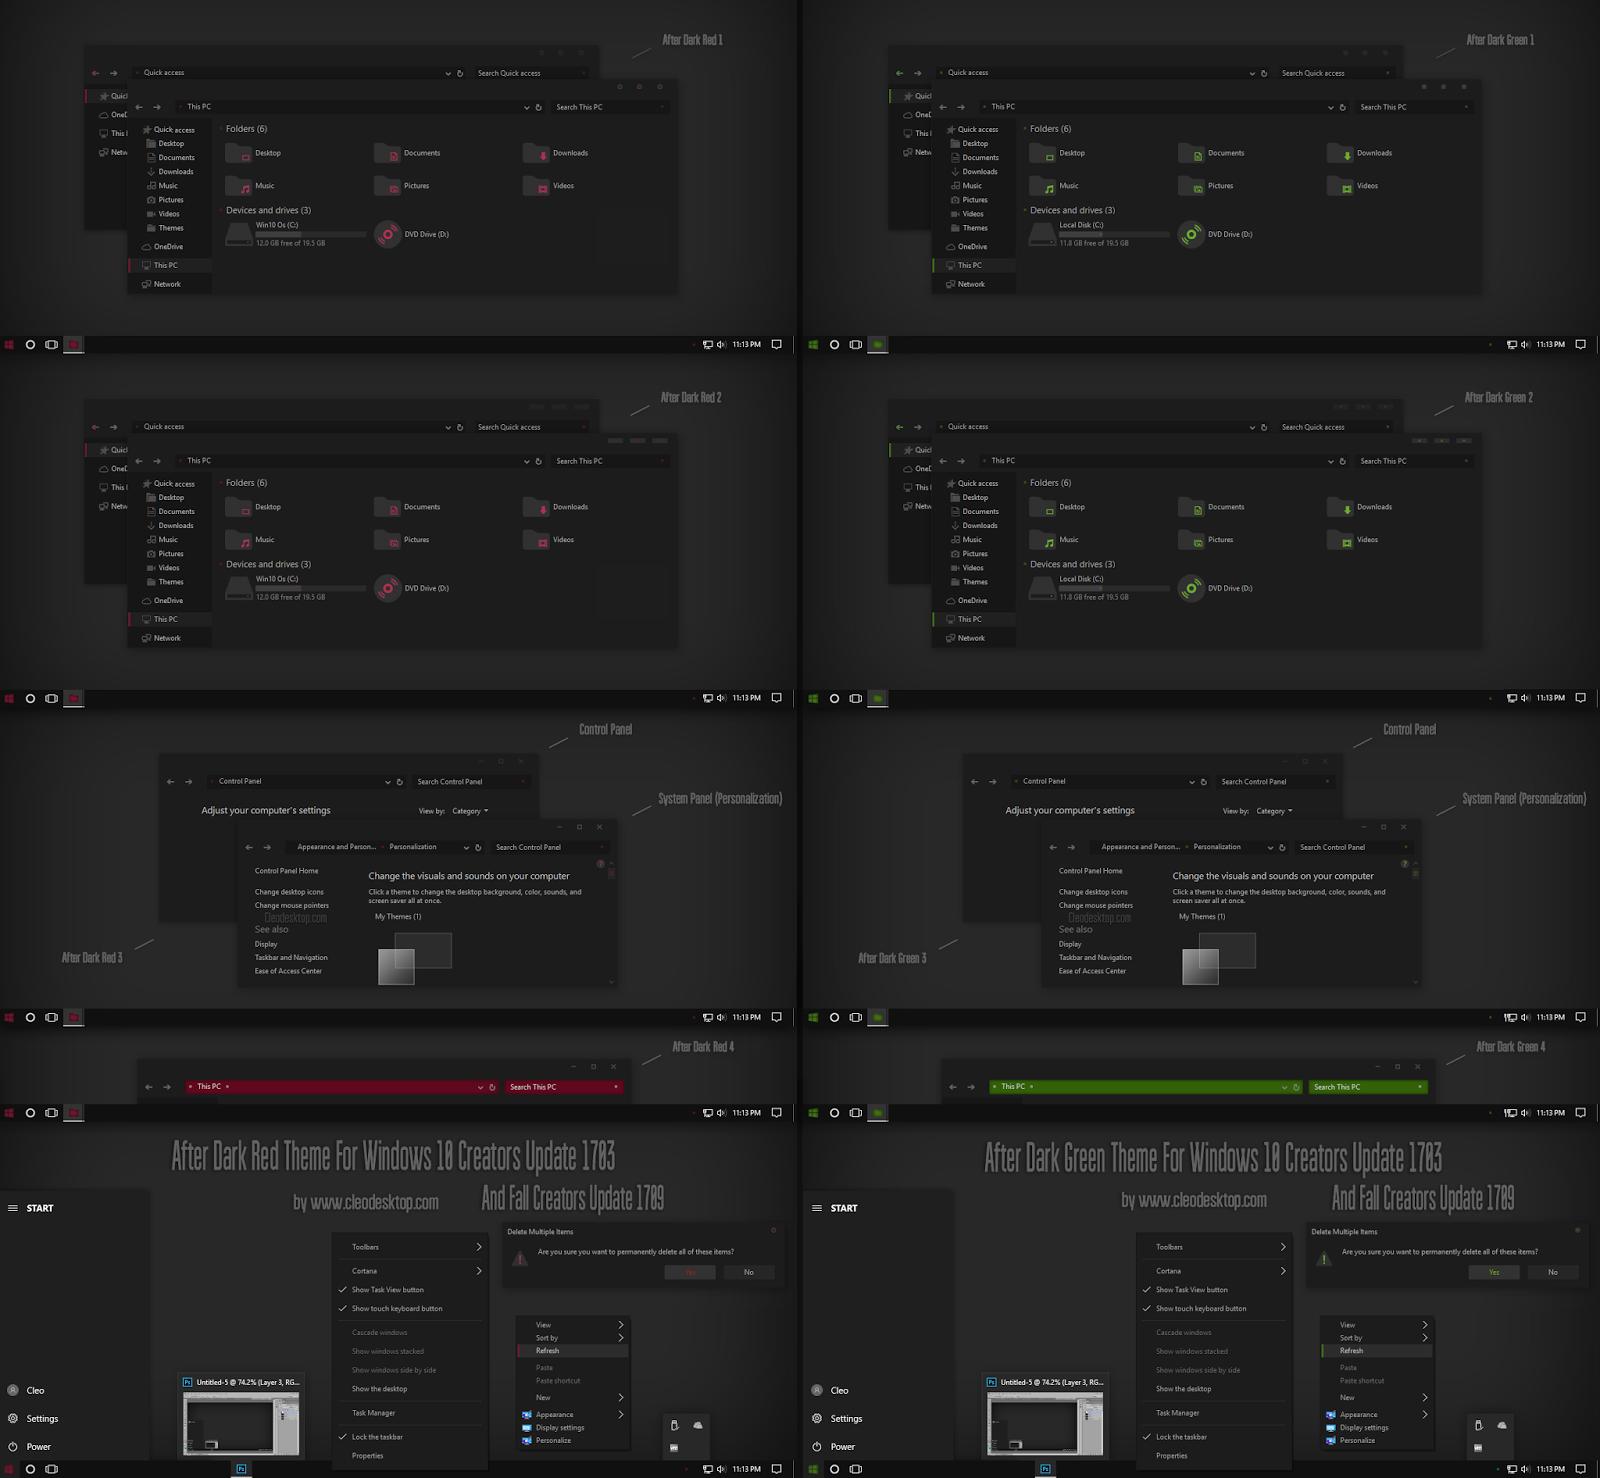 Make Nice Desktop Theme Win 10, Theme Win 7, Theme Win 8